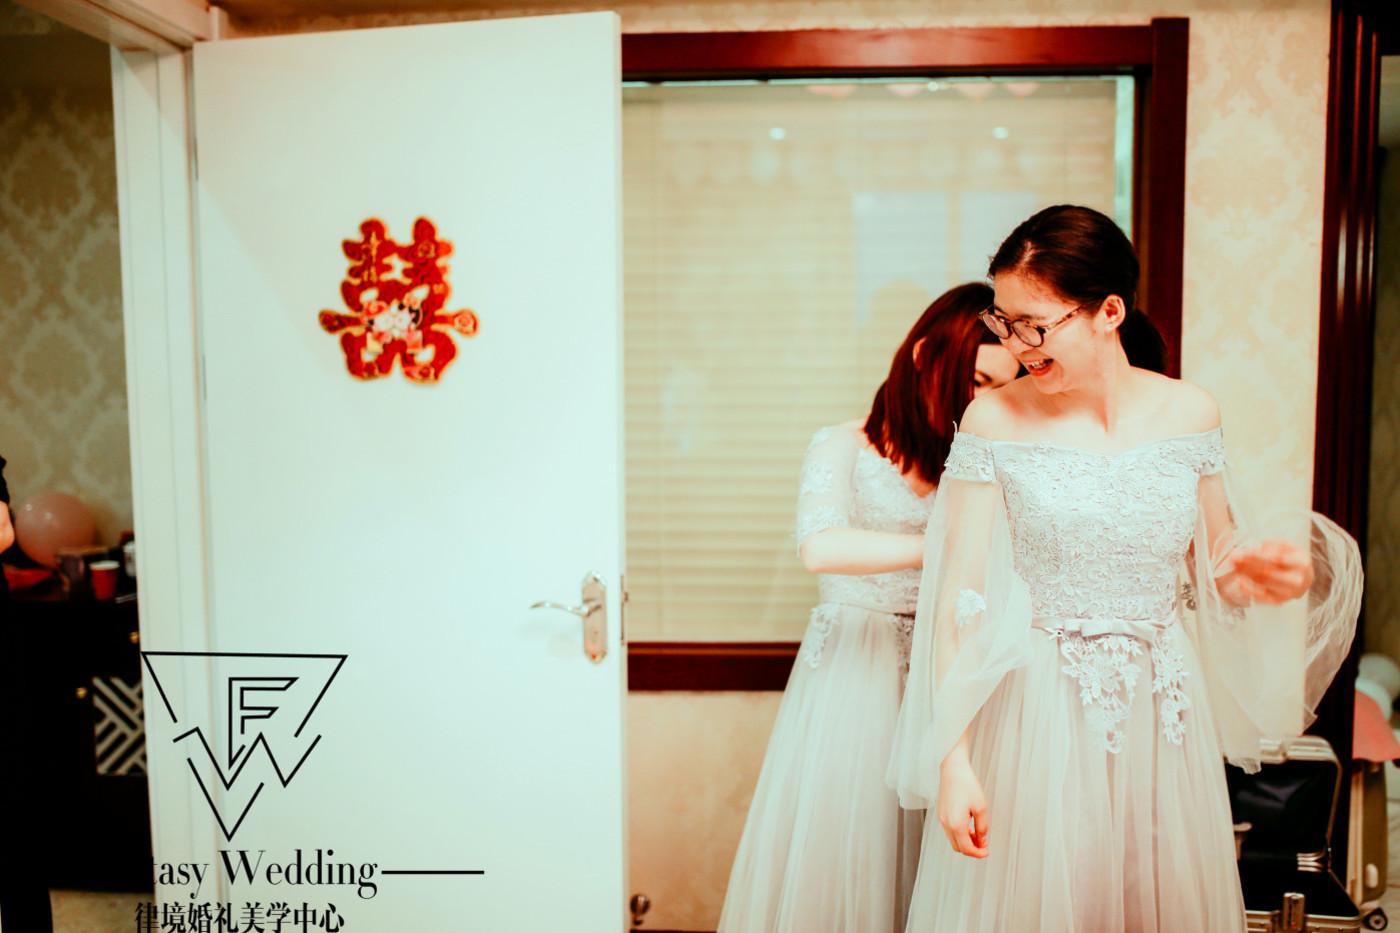 「Fantasy Wedding」& A/P 南艳湖3